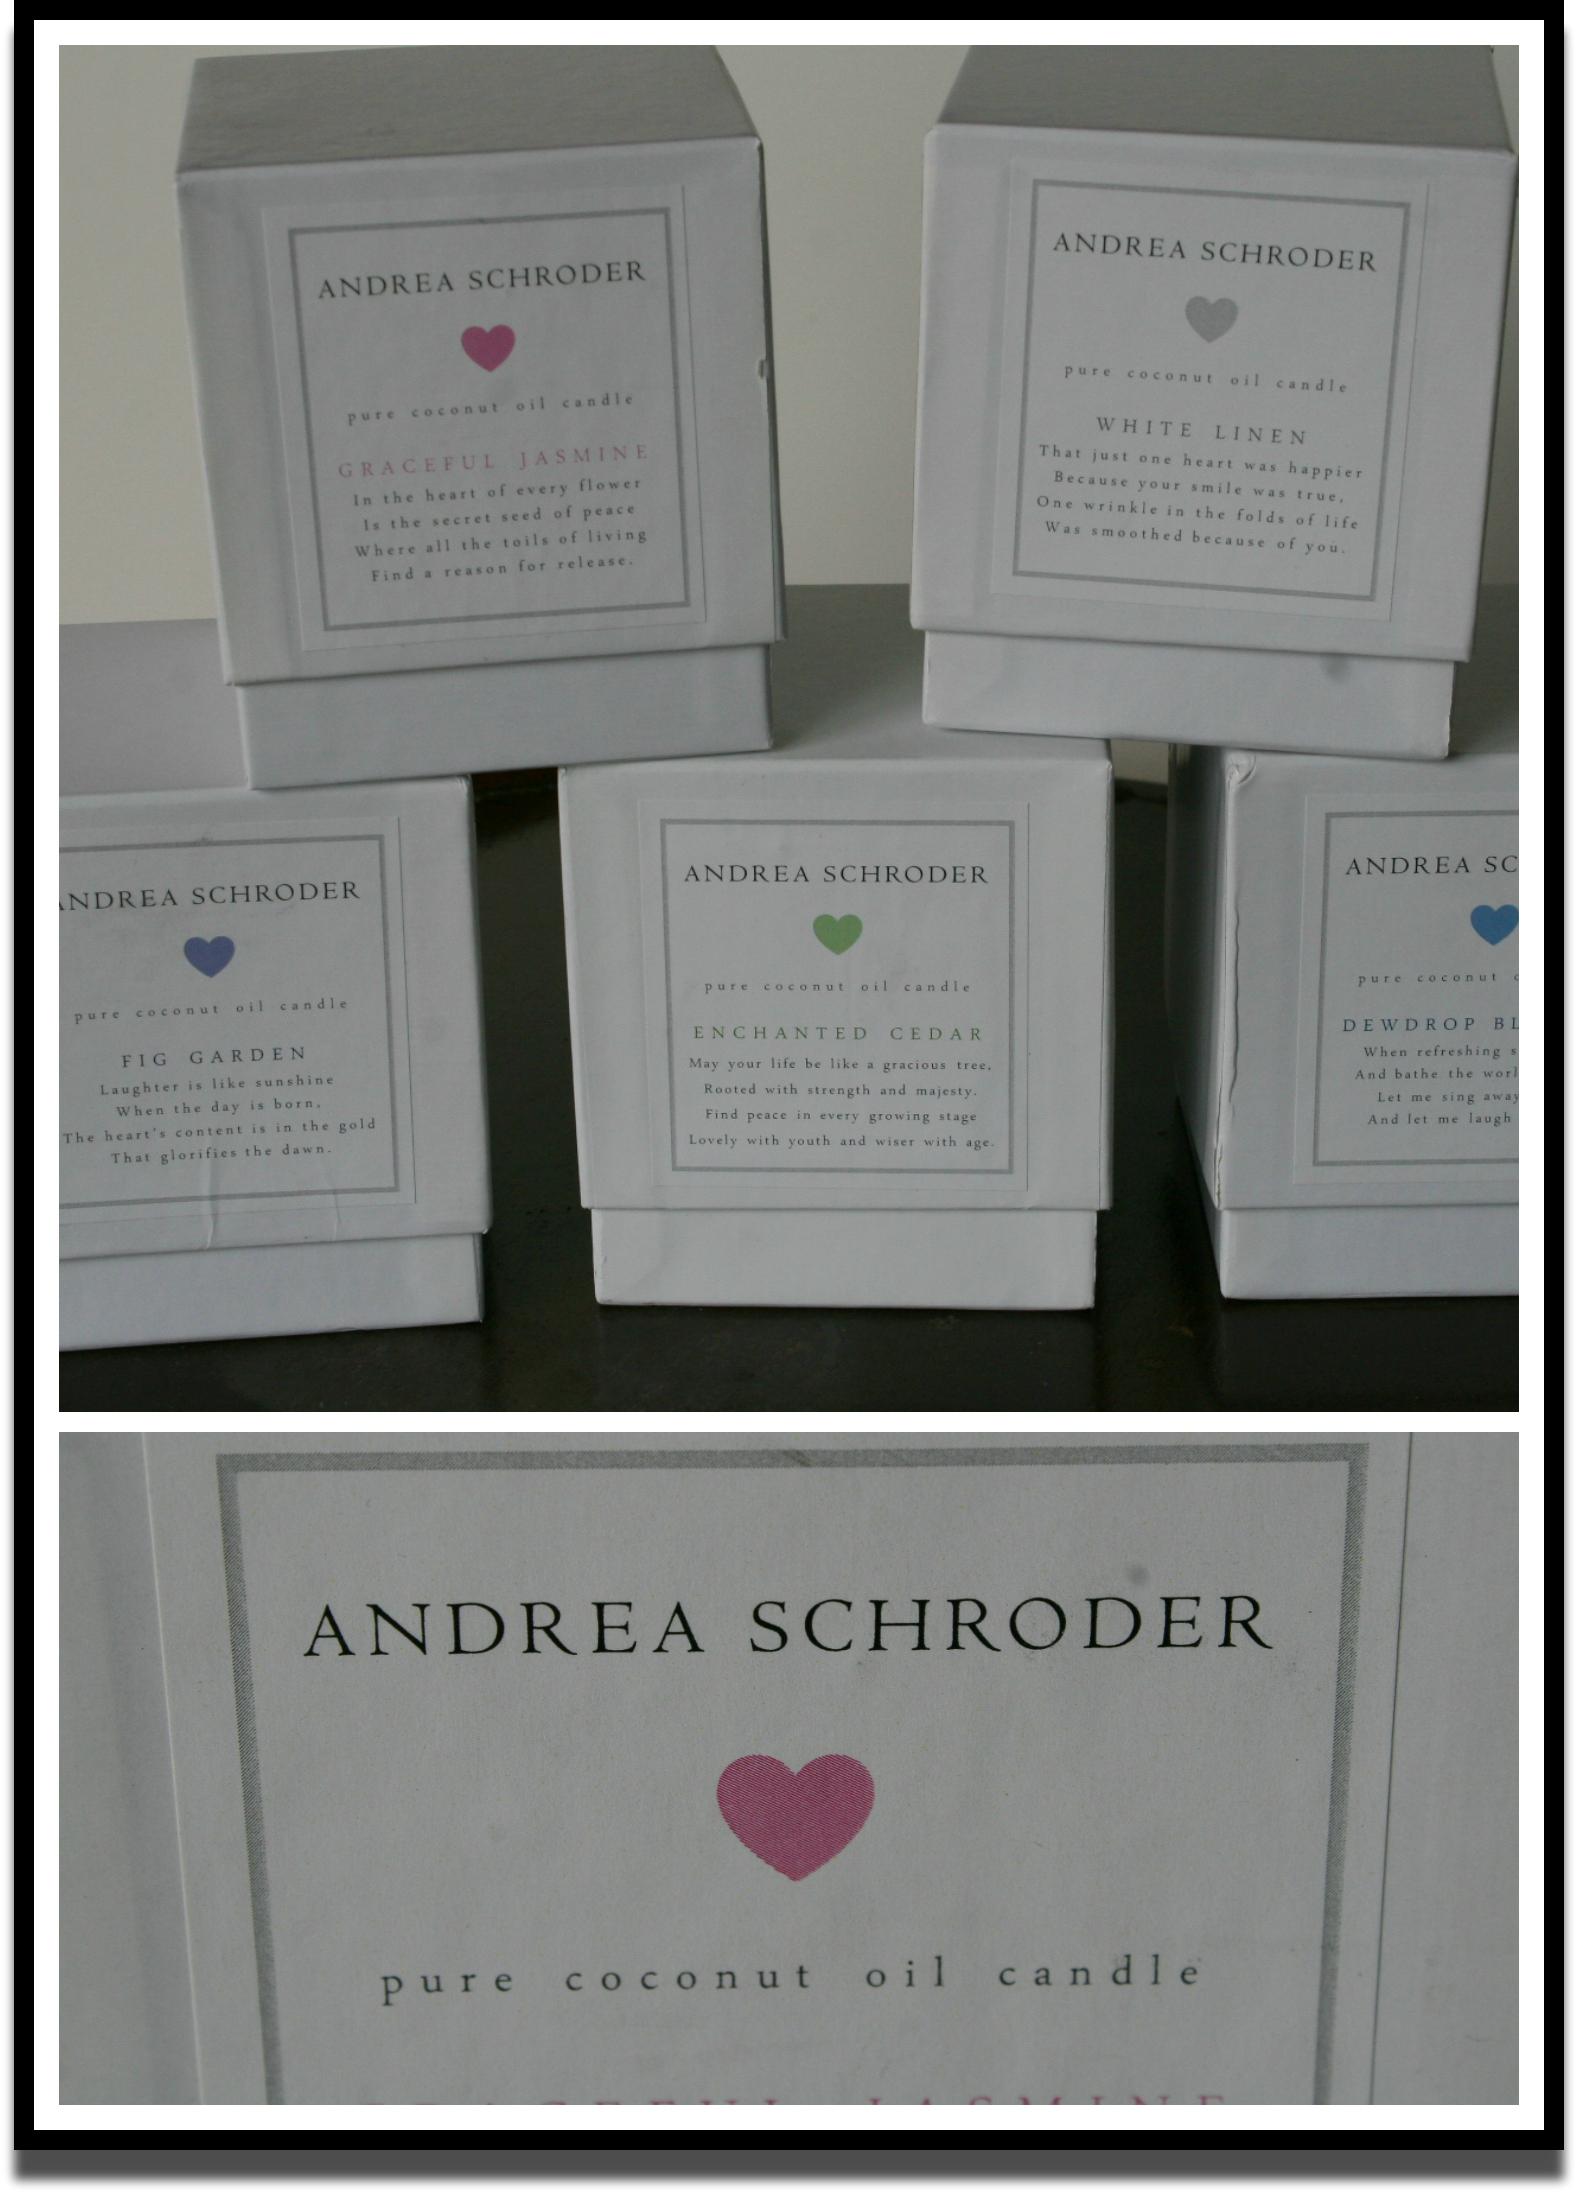 AndreaShroderCandleBoxes